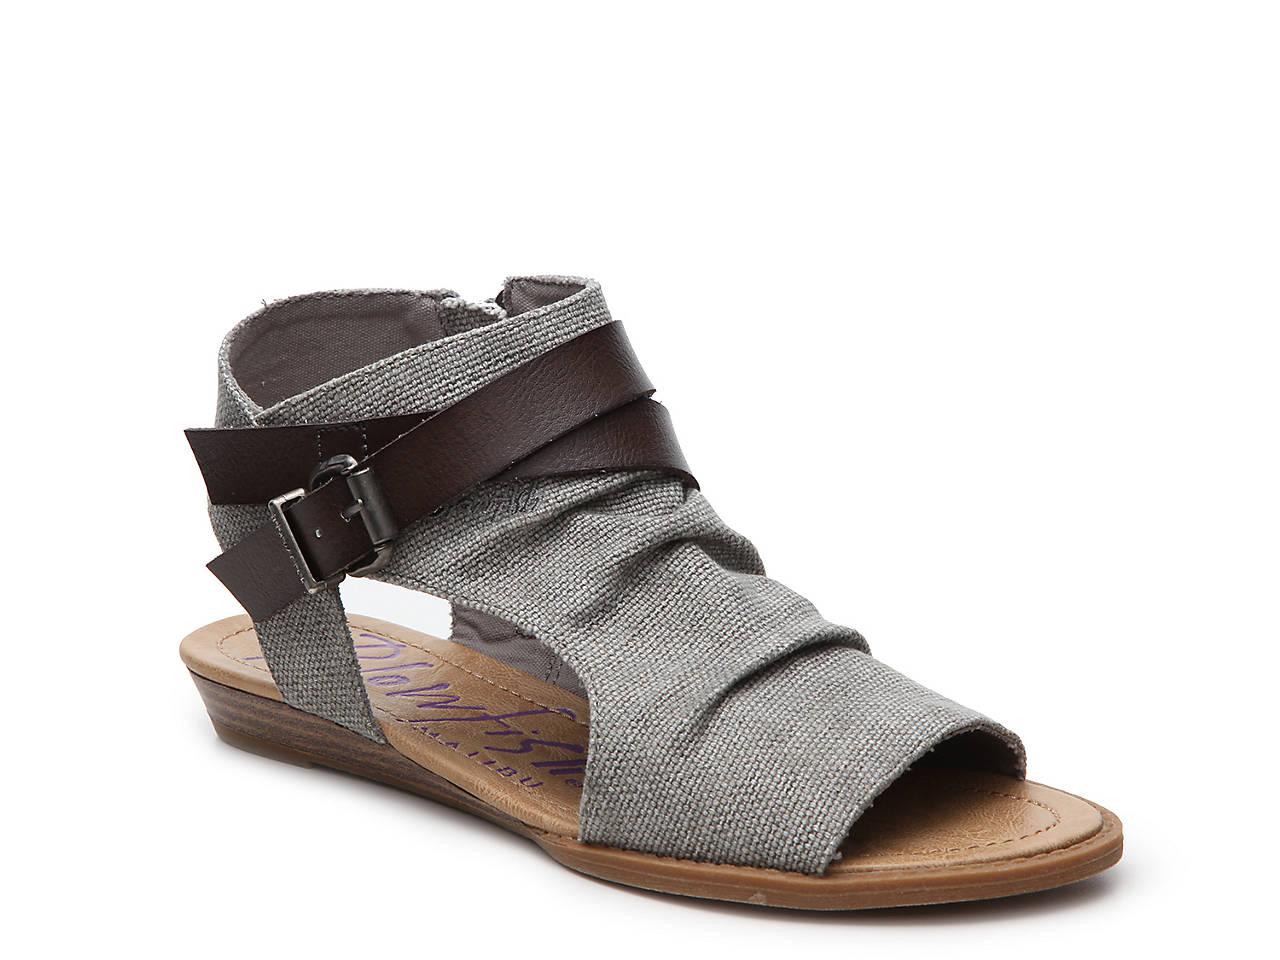 03b6aab38815 Blowfish Balla Wedge Sandal Women s Shoes